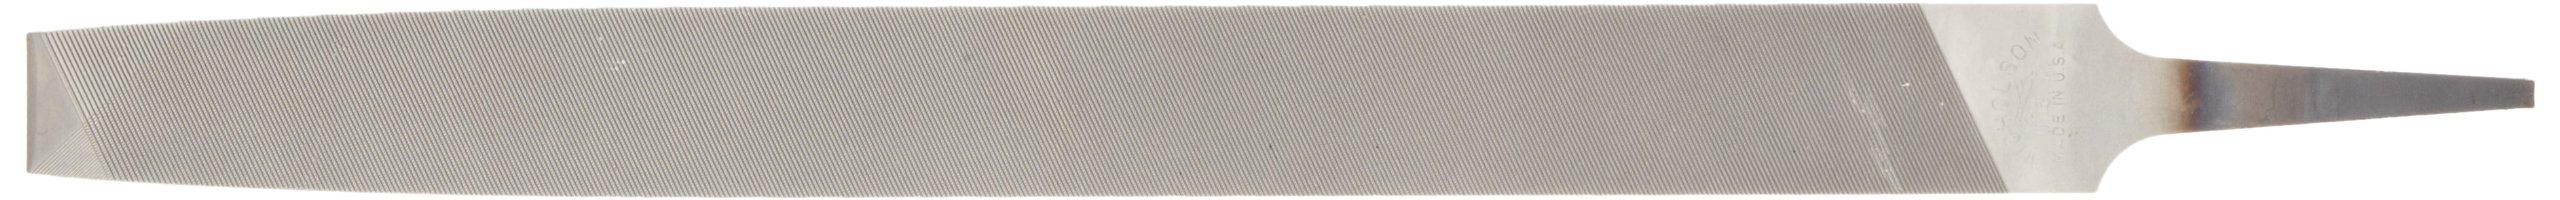 Nicholson Flat Hand File (Boxed), American Pattern, Double Cut, Rectangular, Fine, 12'' Length